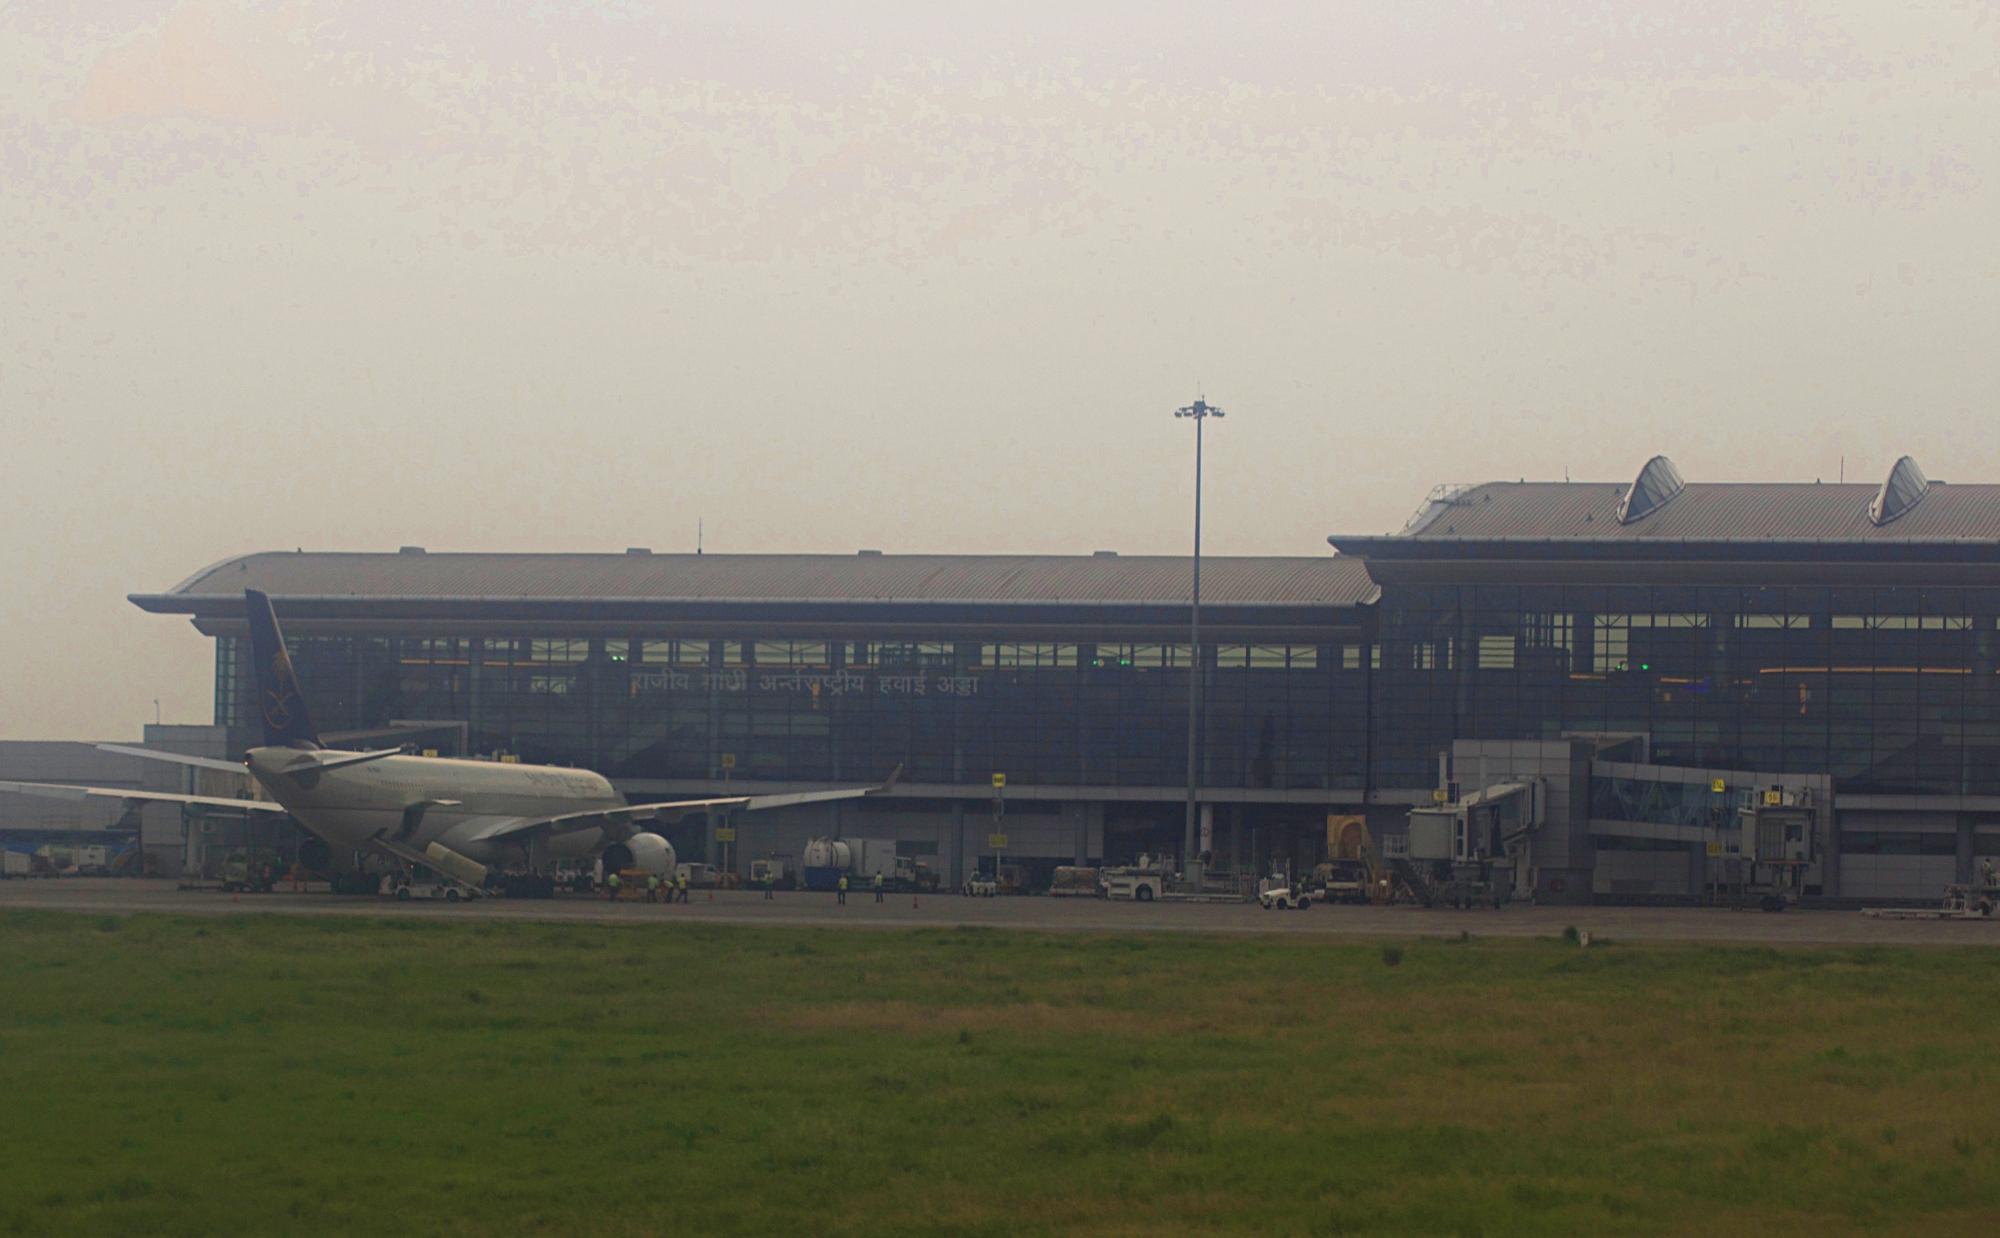 Rajiv Gandhi Airport Hyderabad